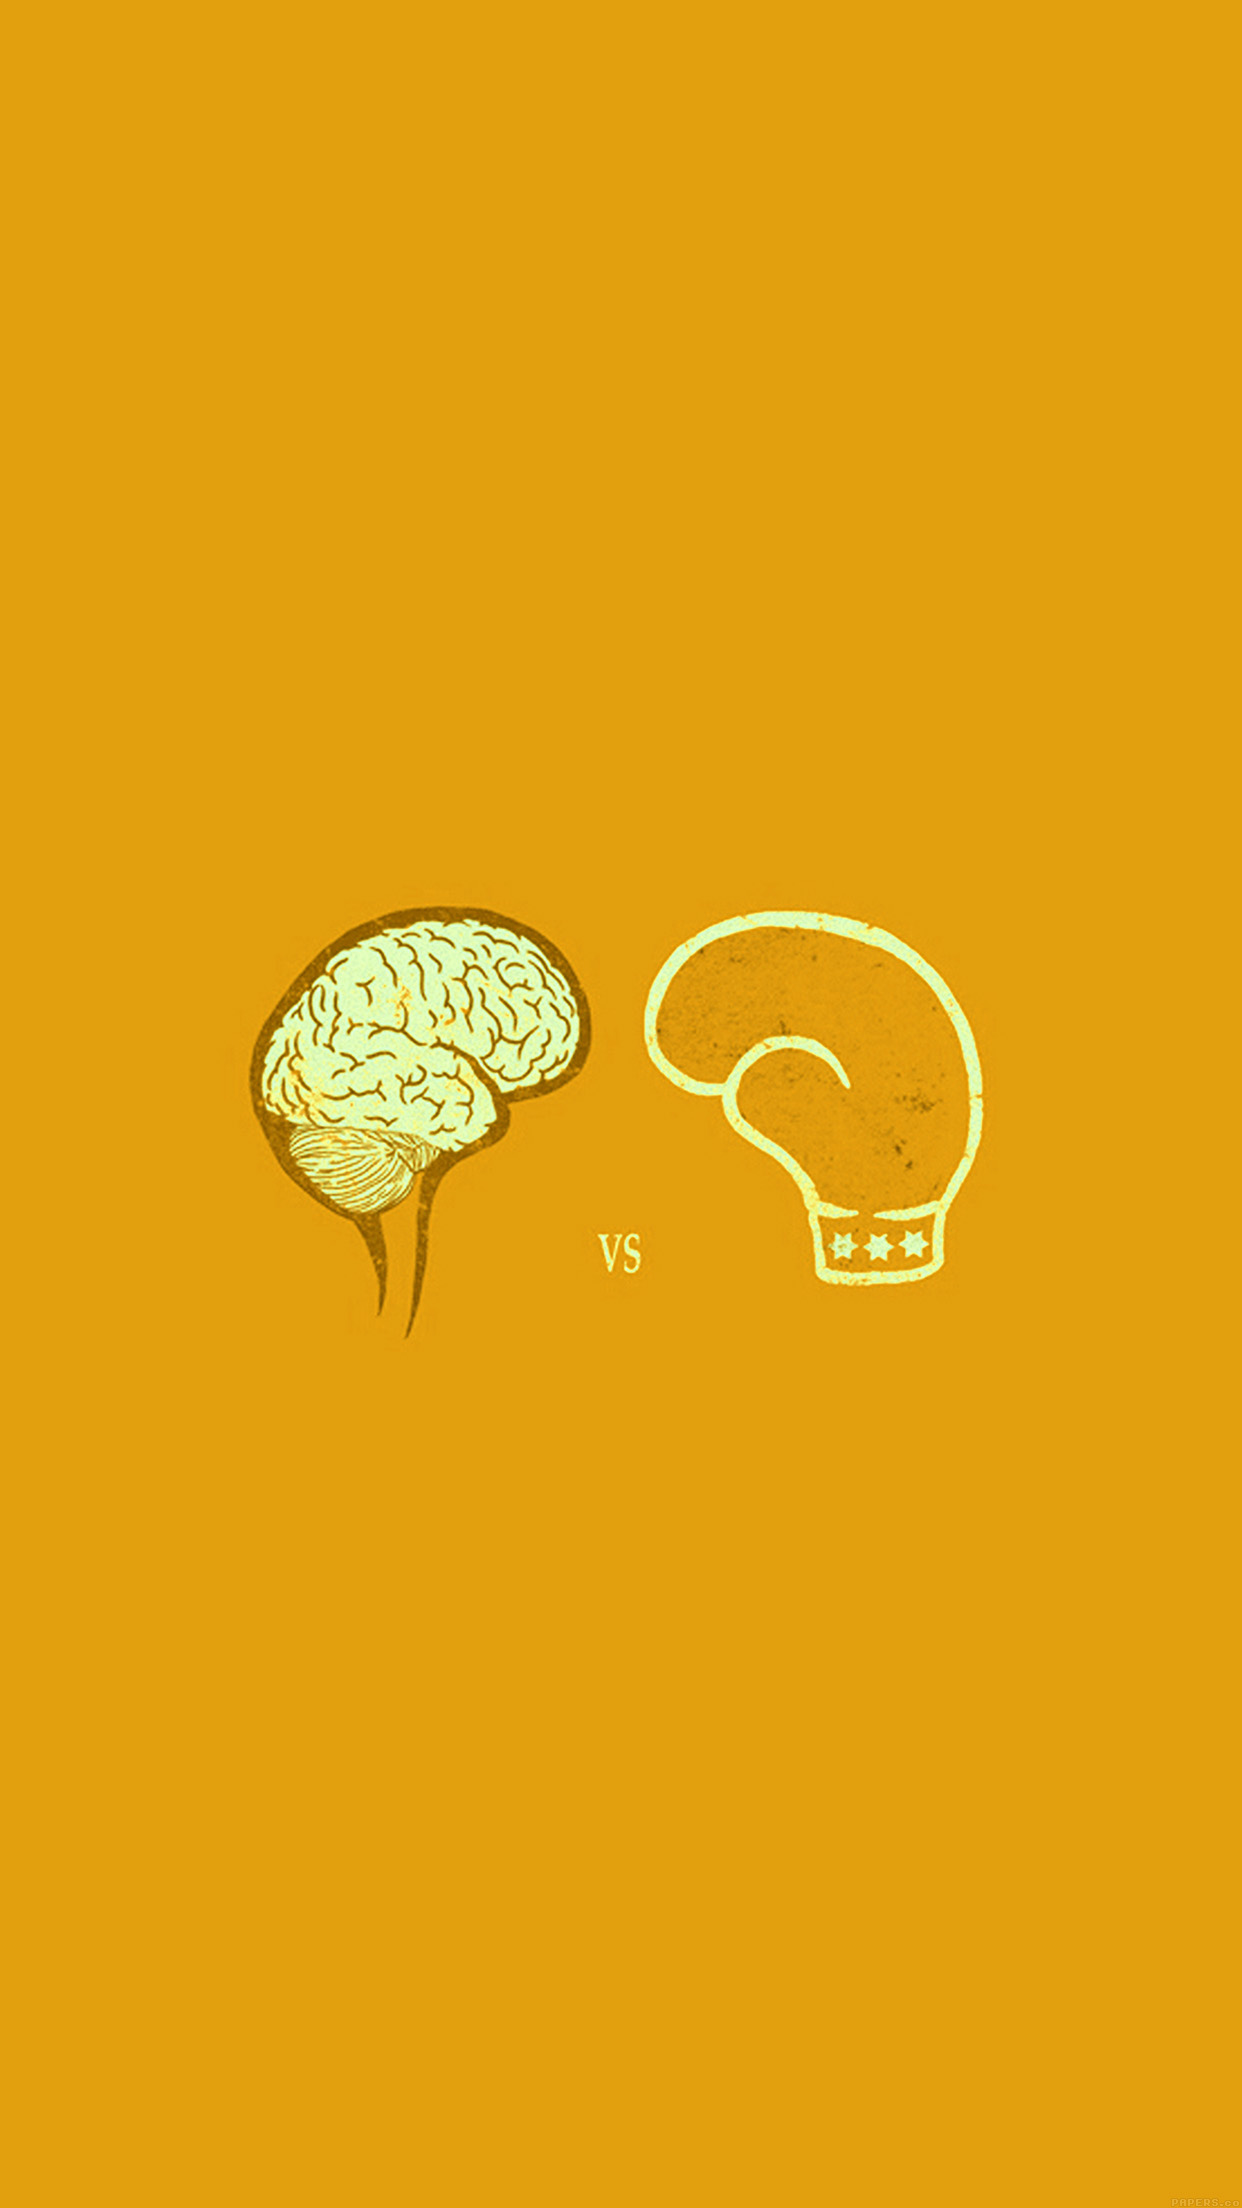 Samsung Note 4 Car Wallpapers Ai23 Brain Vs Boxing Illust Gold Minimal Art Wallpaper